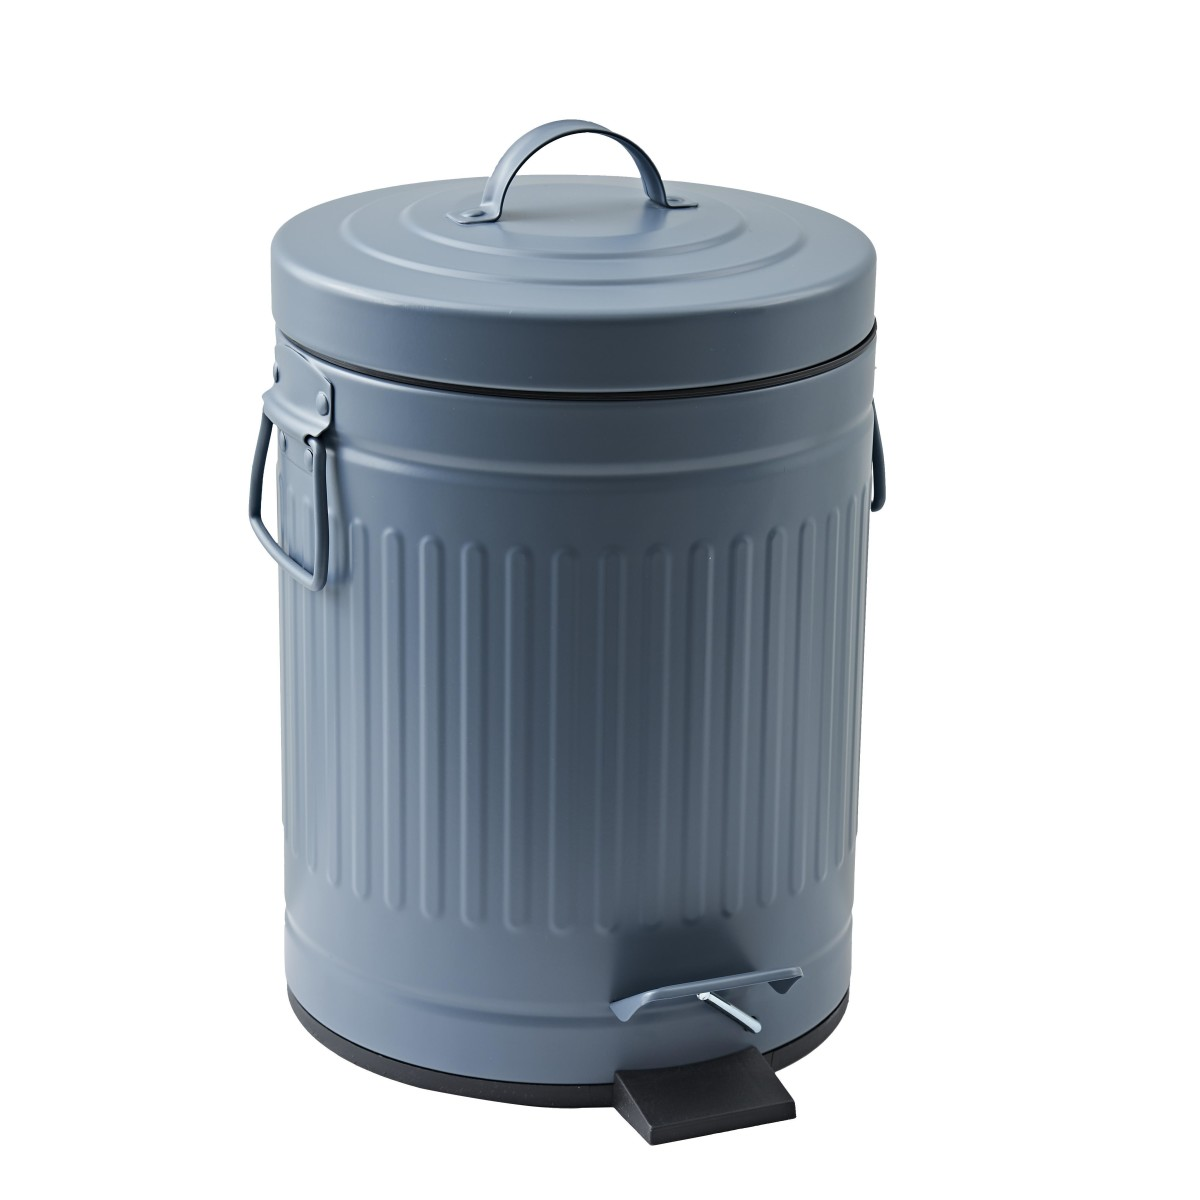 Контейнер для мусора Street 5 л цвет серый/синий